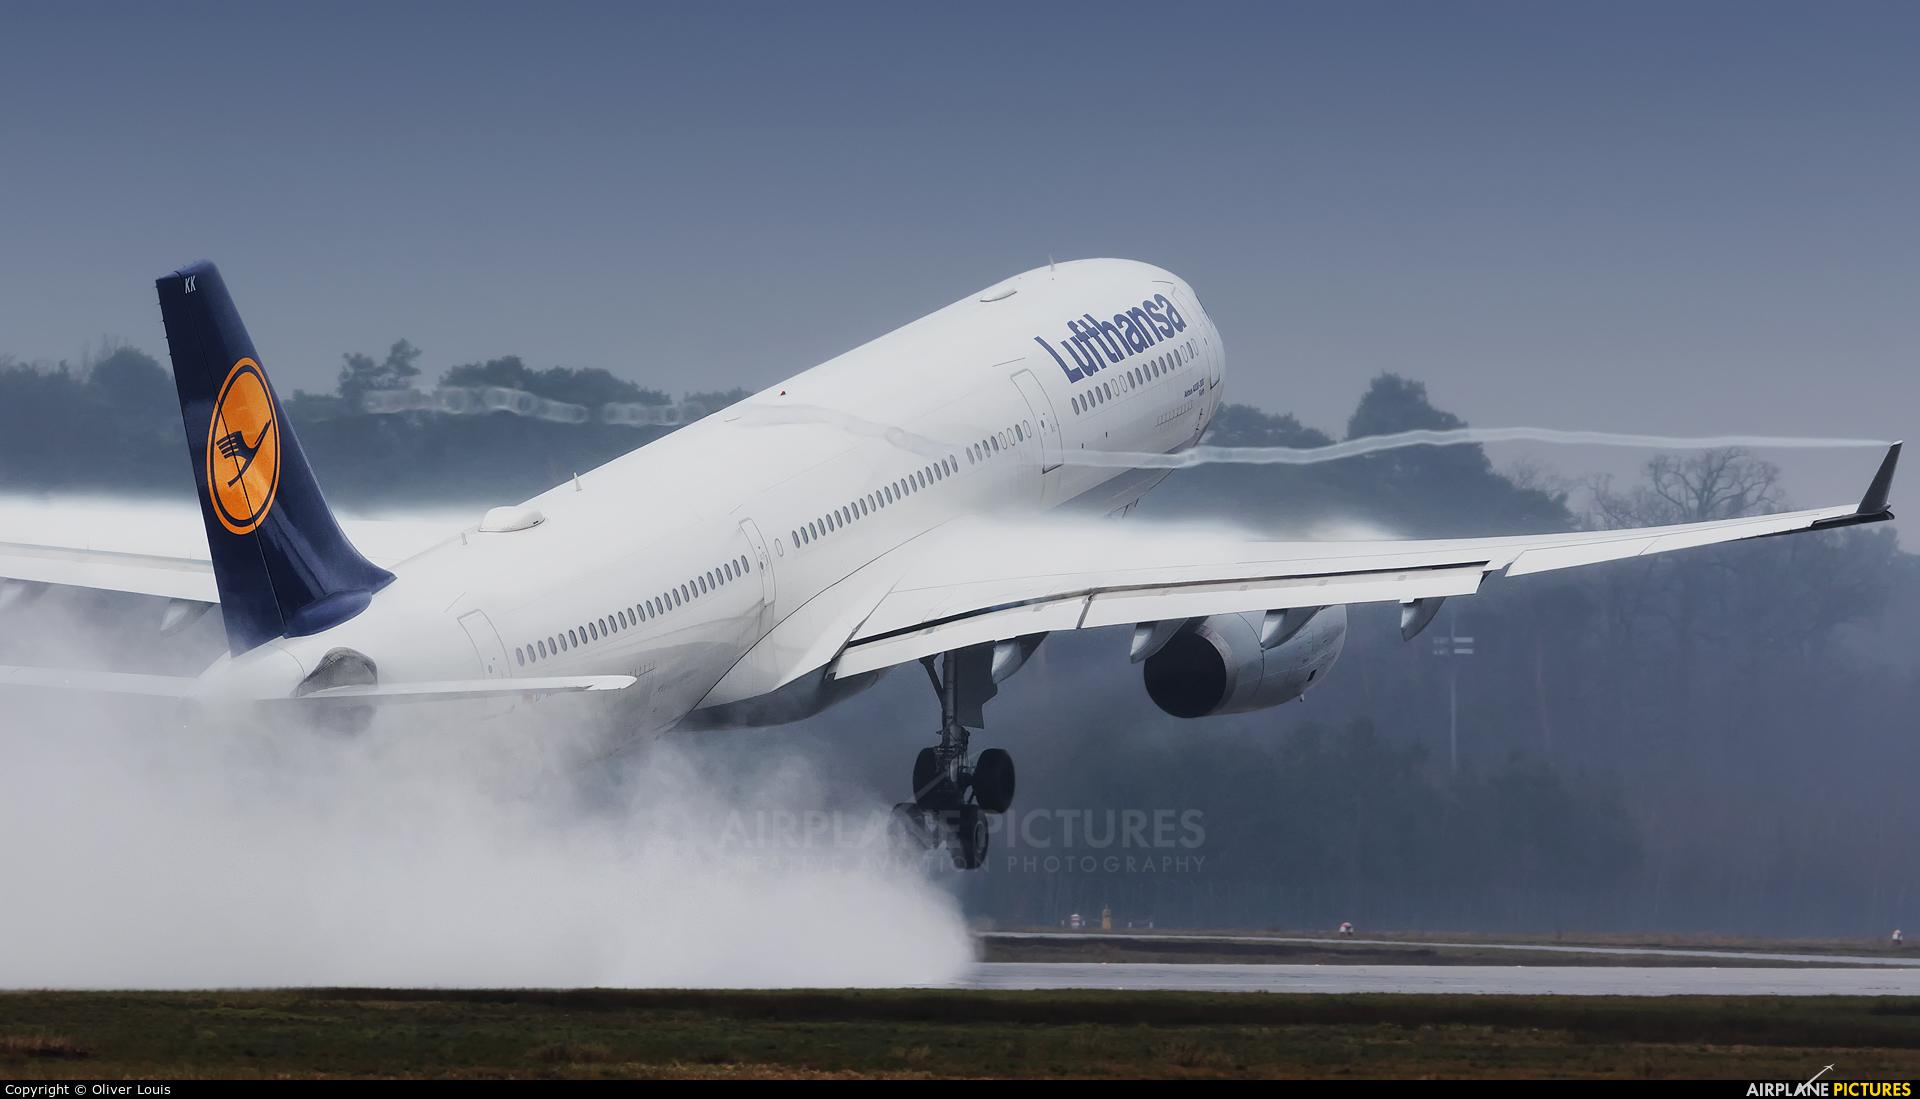 Lufthansa D-AIKK aircraft at Frankfurt